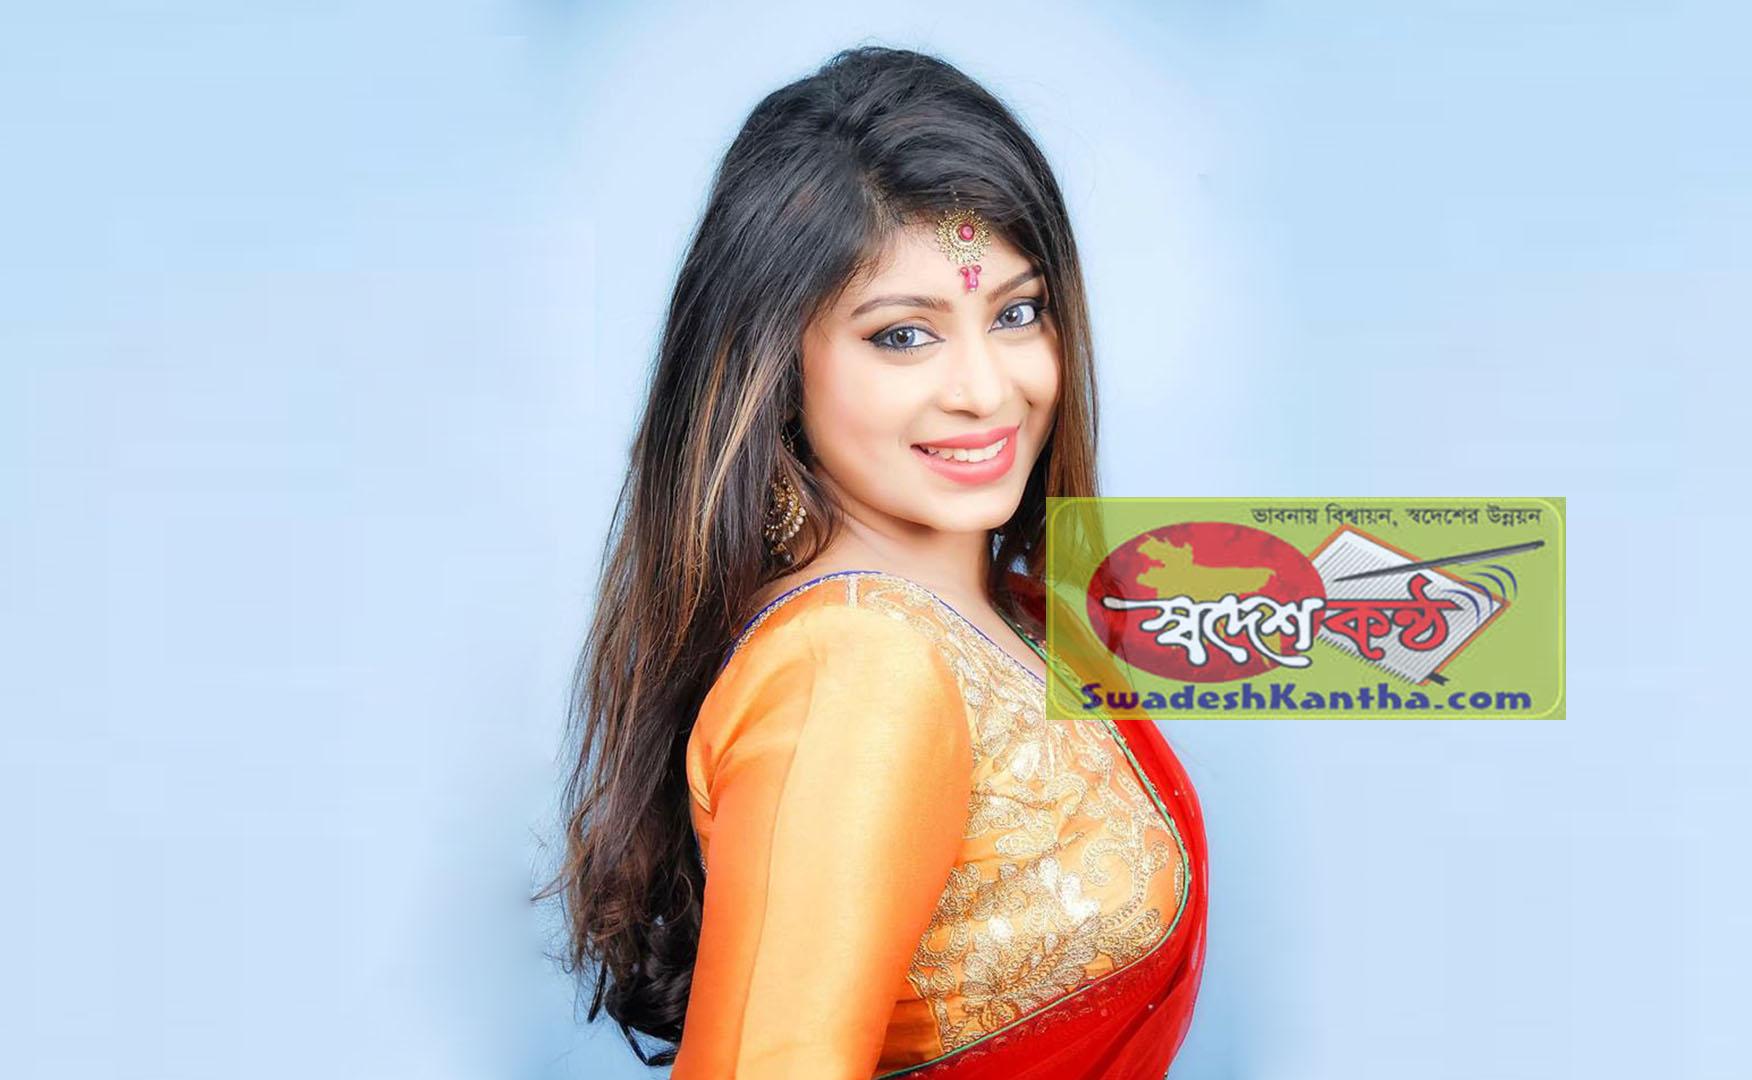 misty jannat-swadeshkantha